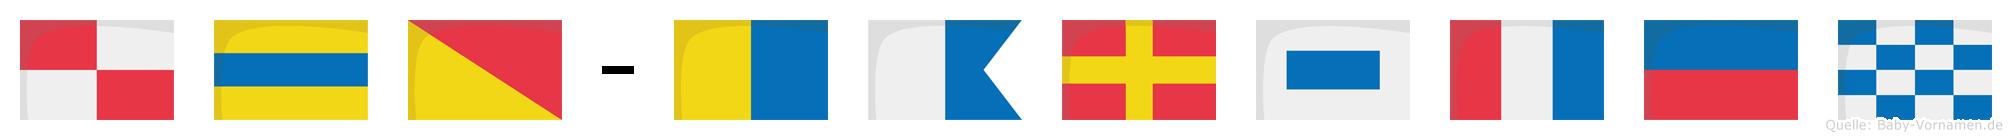 Udo-Karsten im Flaggenalphabet